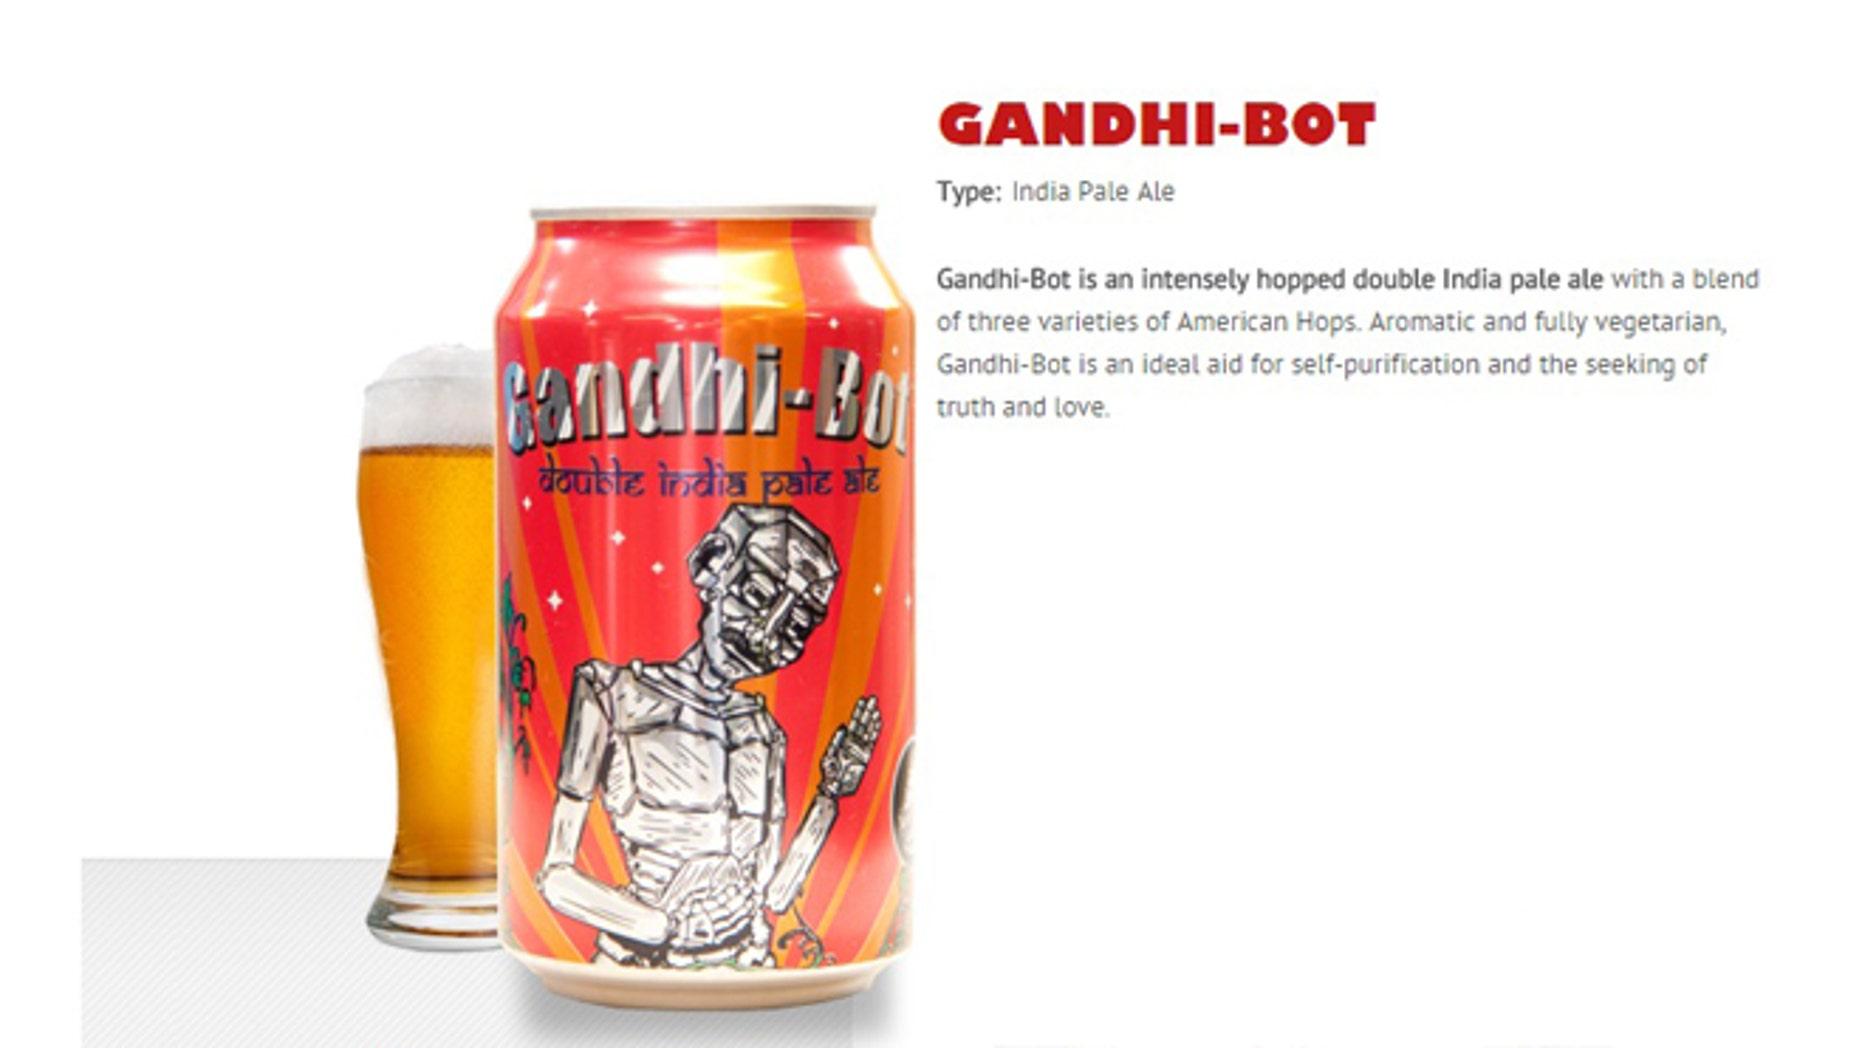 A can of Gandhi-bot beer.